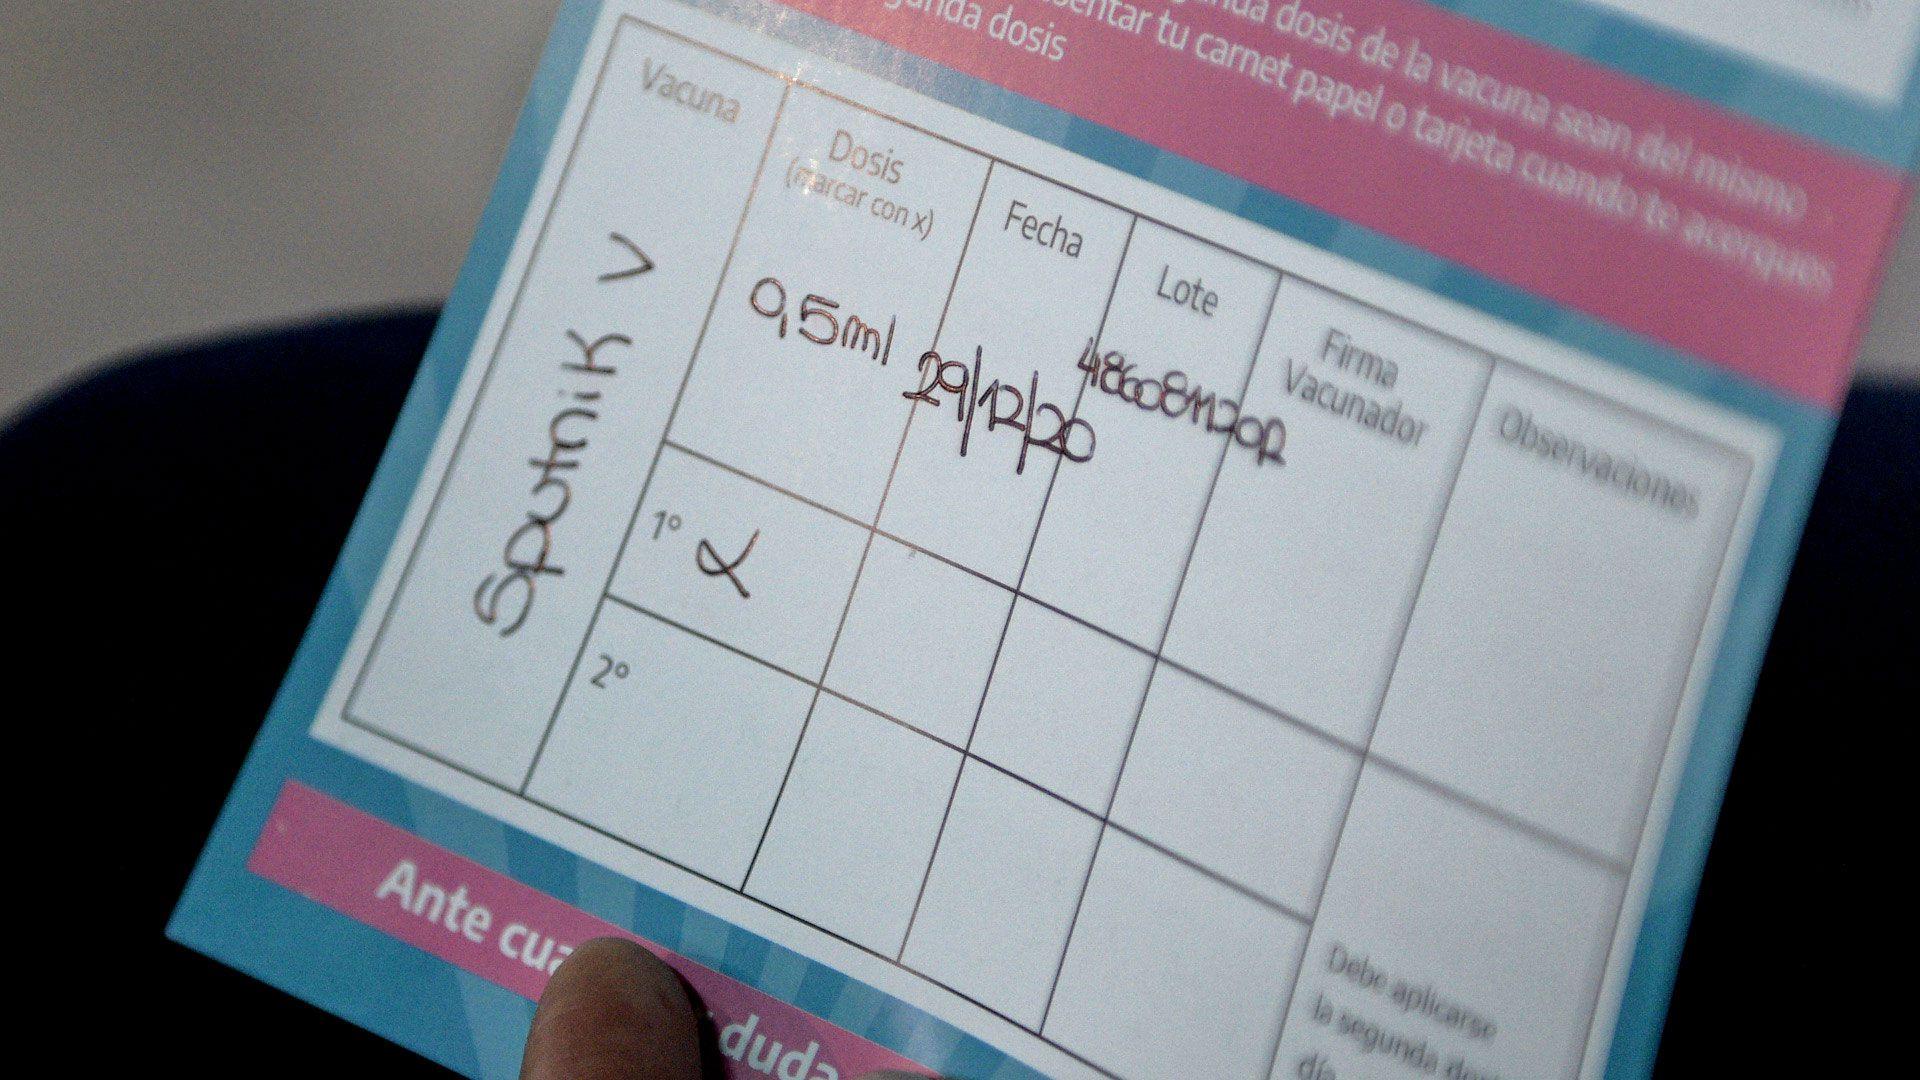 vacunacion-hospital-fiorito-avellaneda-vacuna-sputnik-V-covid